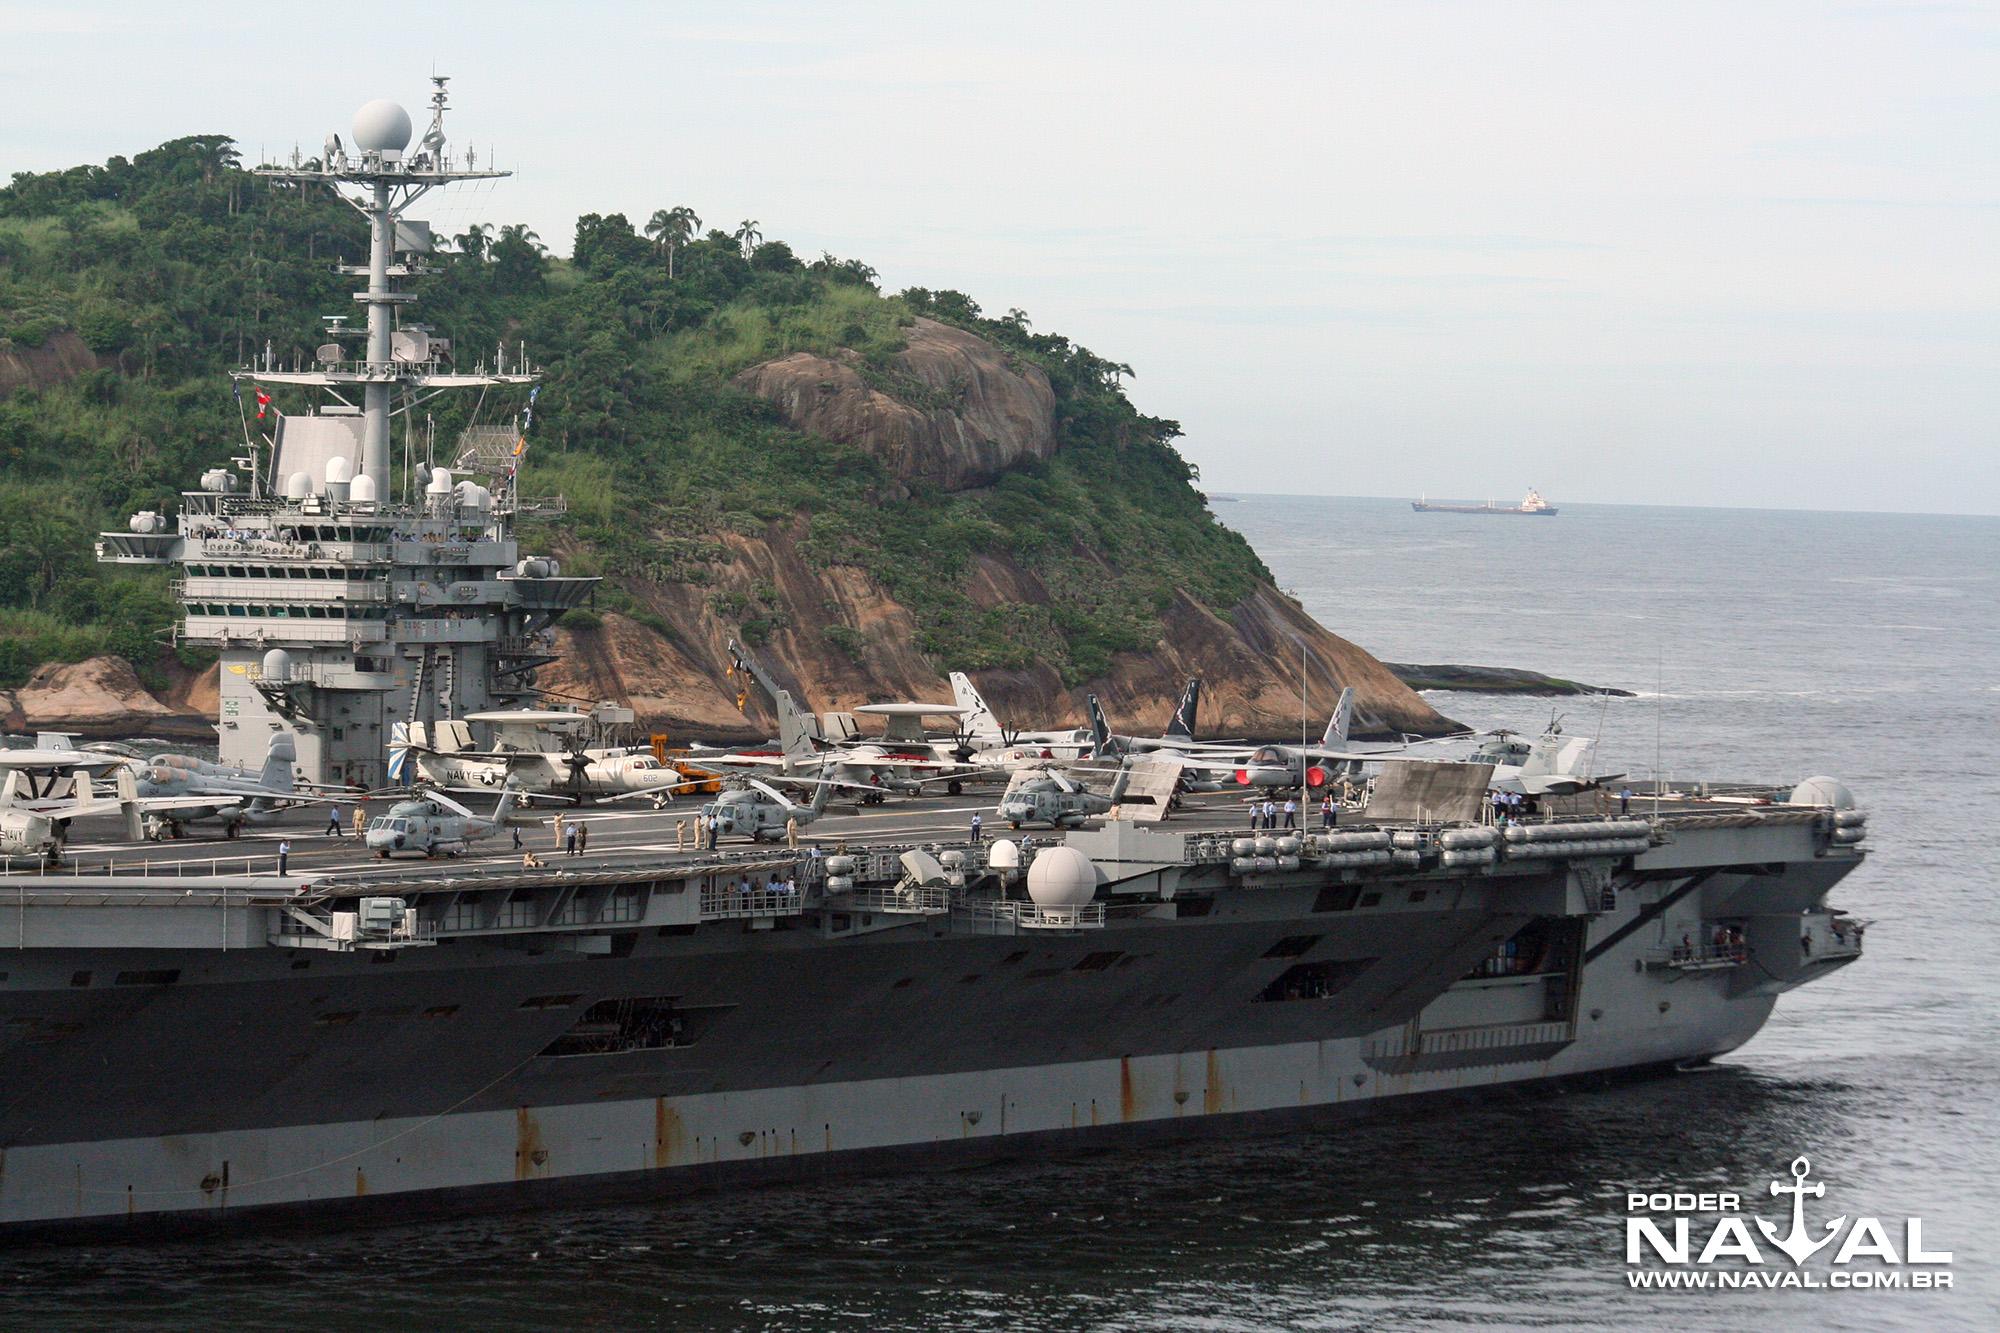 USS George Washington (CVN-73) no Rio - 2008 - 12